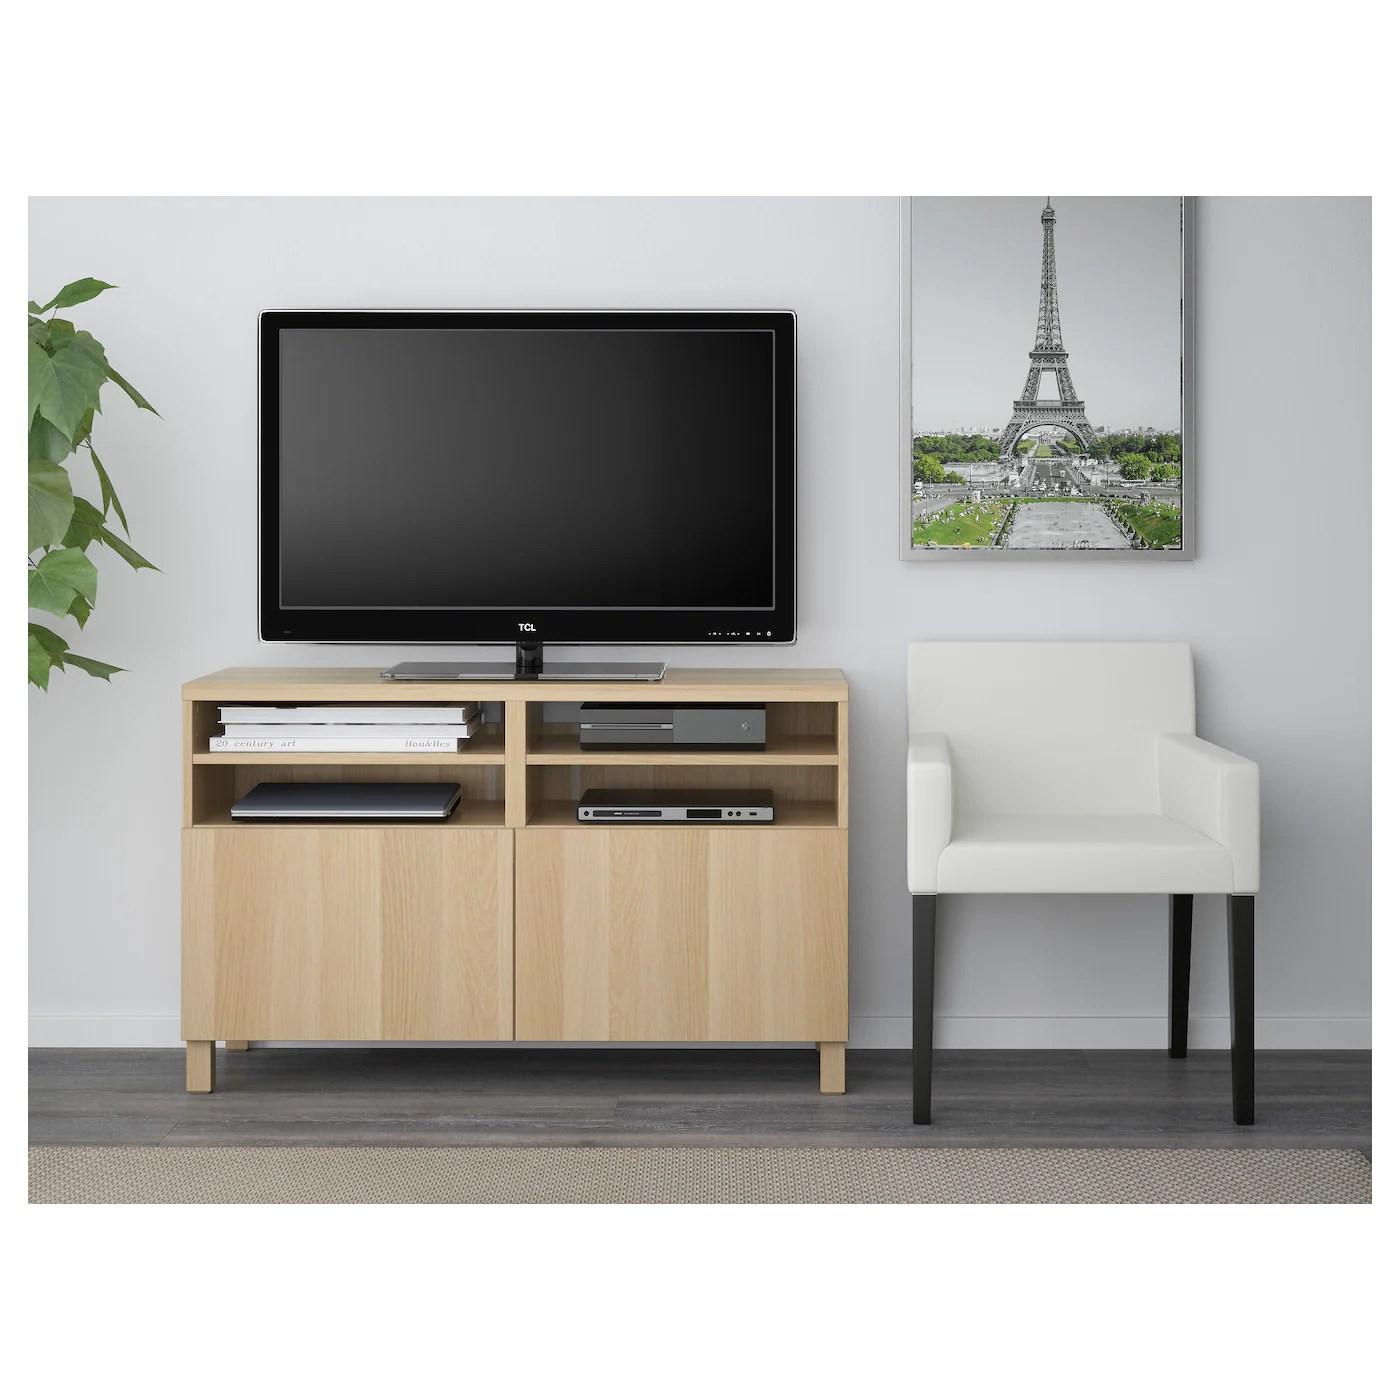 besta banc tv avec portes effet chene blanchi lappviken stubbarp effet chene blanchi 120x42x74 cm